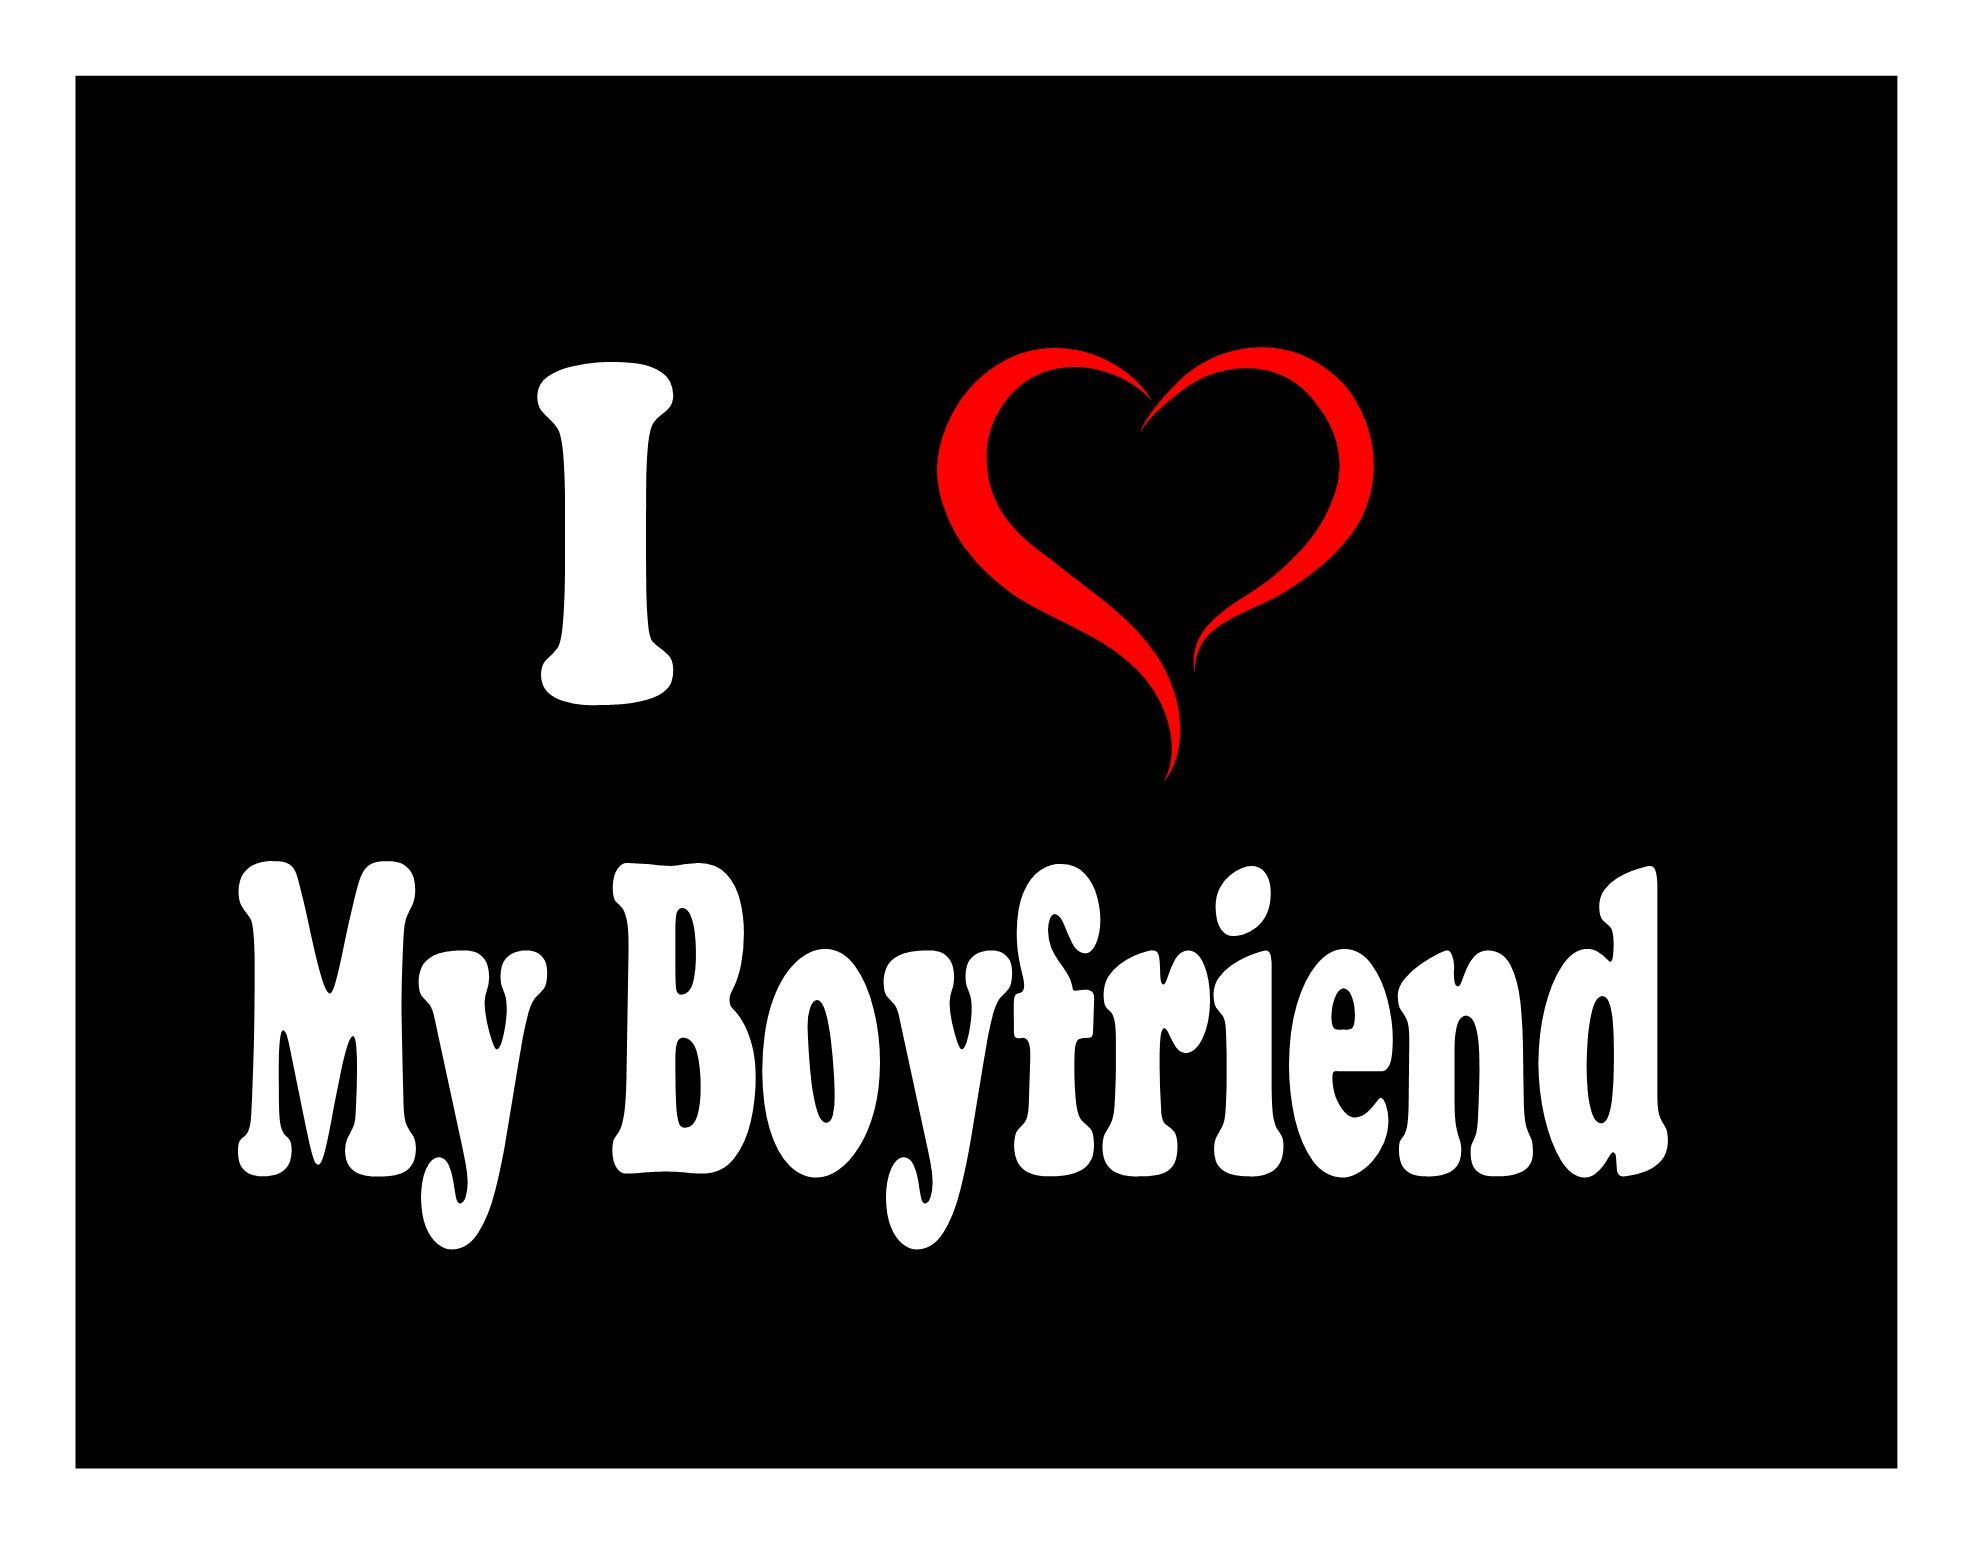 Boyfriend my My boyfriend,